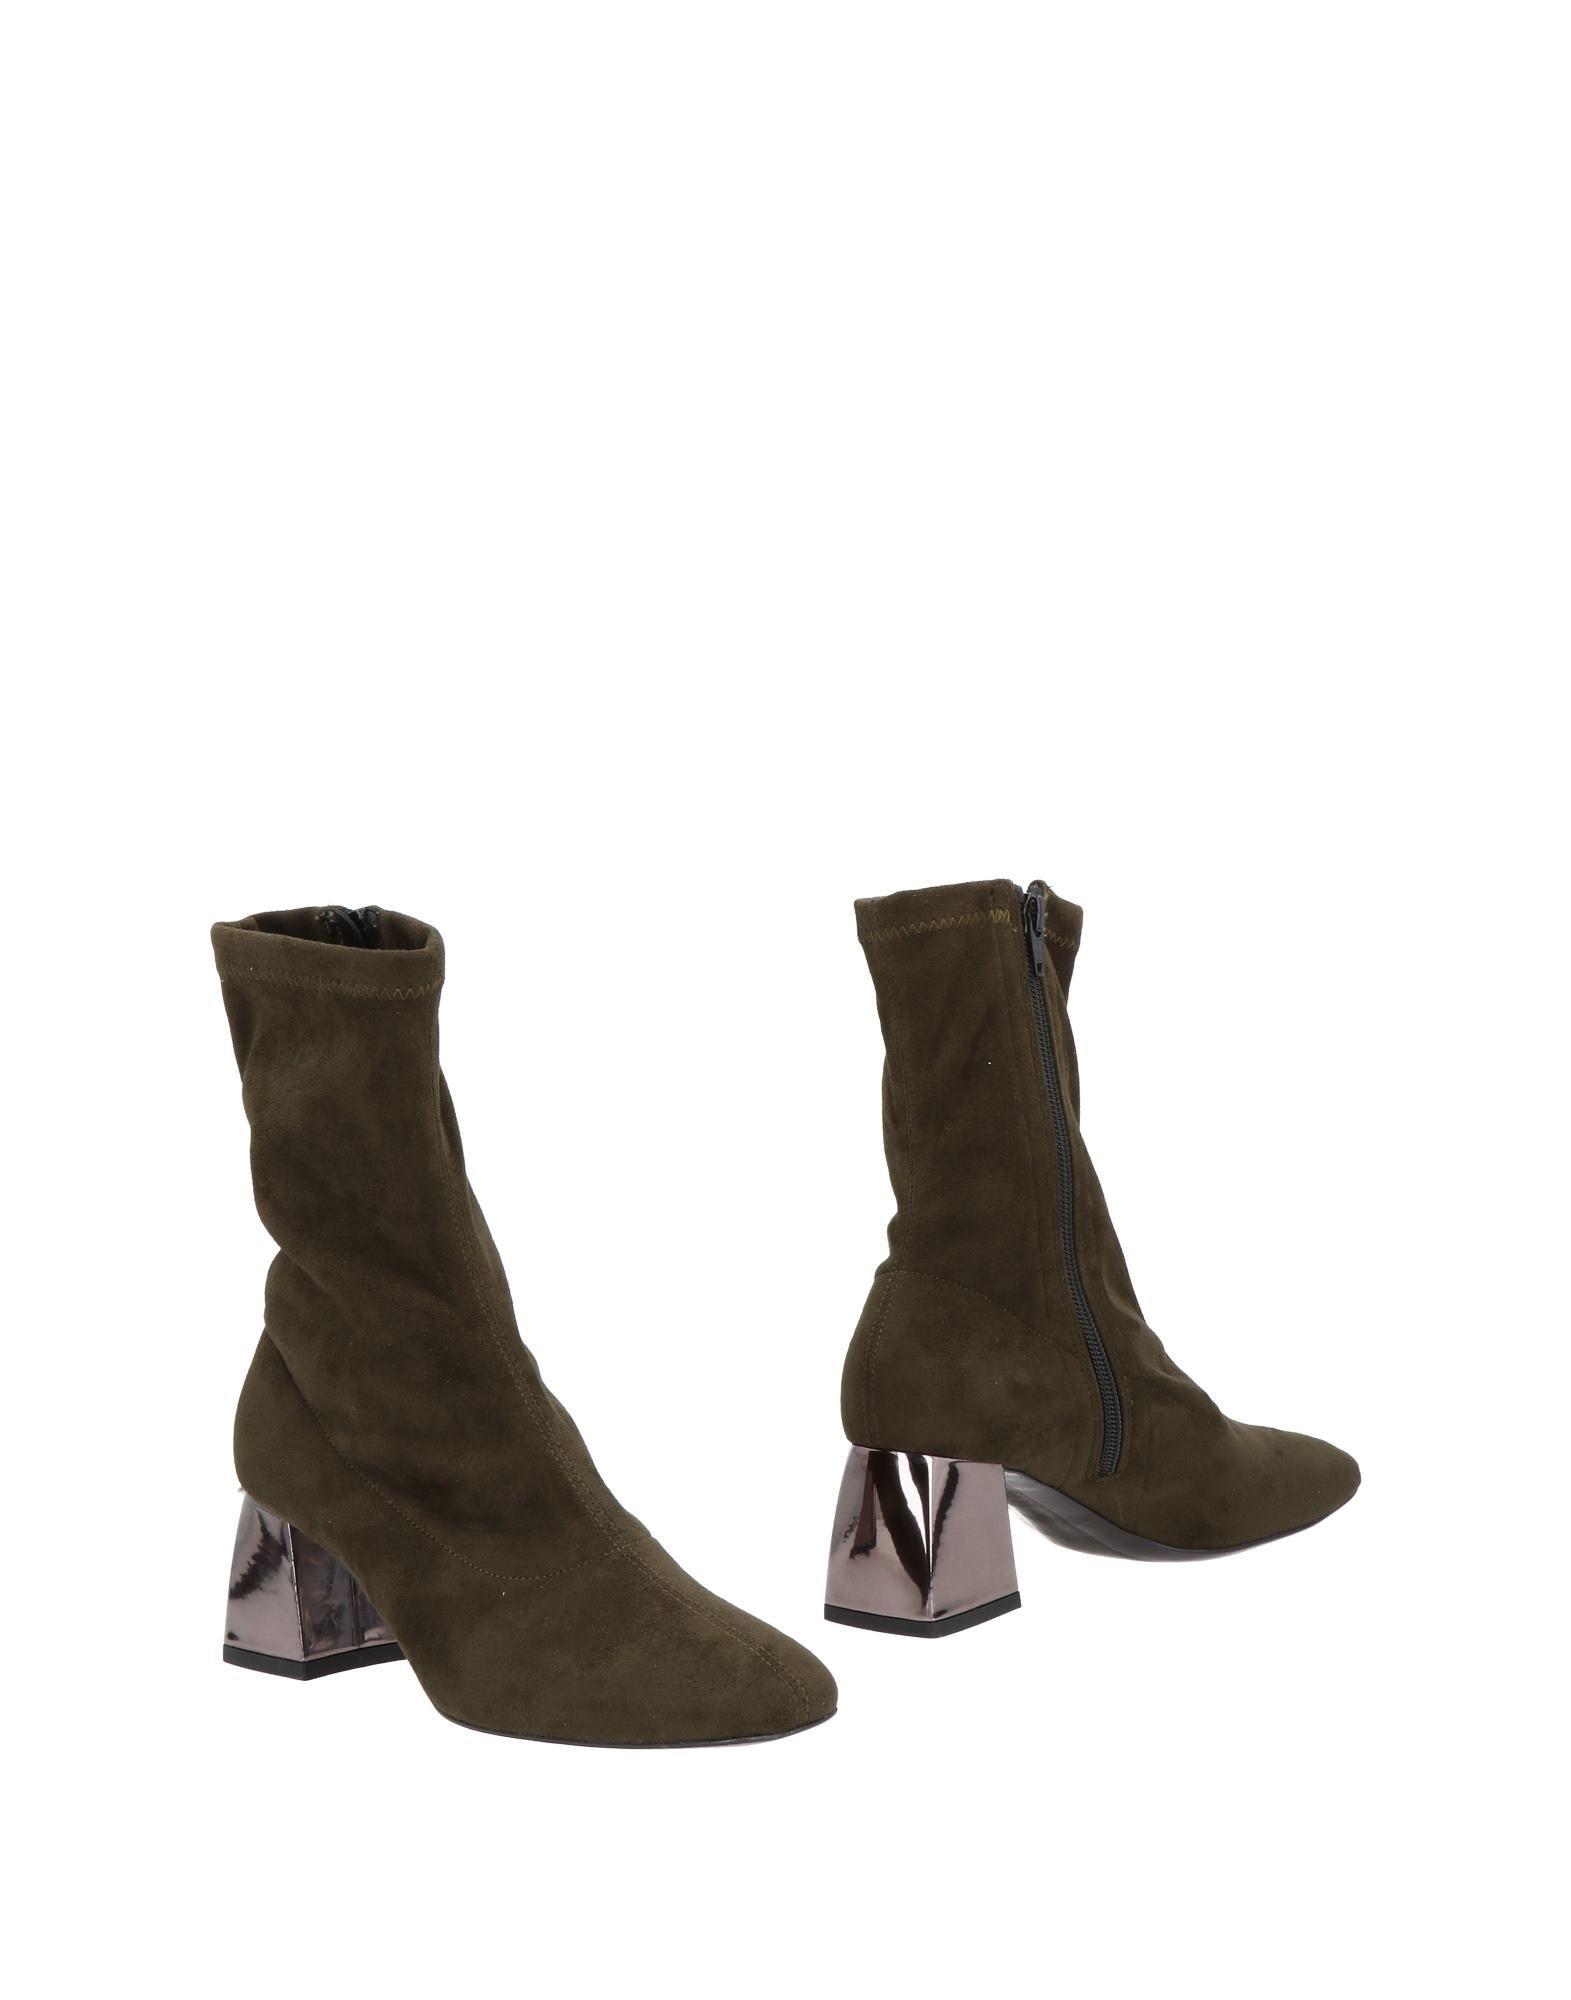 Moda Stivaletti Jeannot Donna Donna Jeannot - 11491982PJ 814770